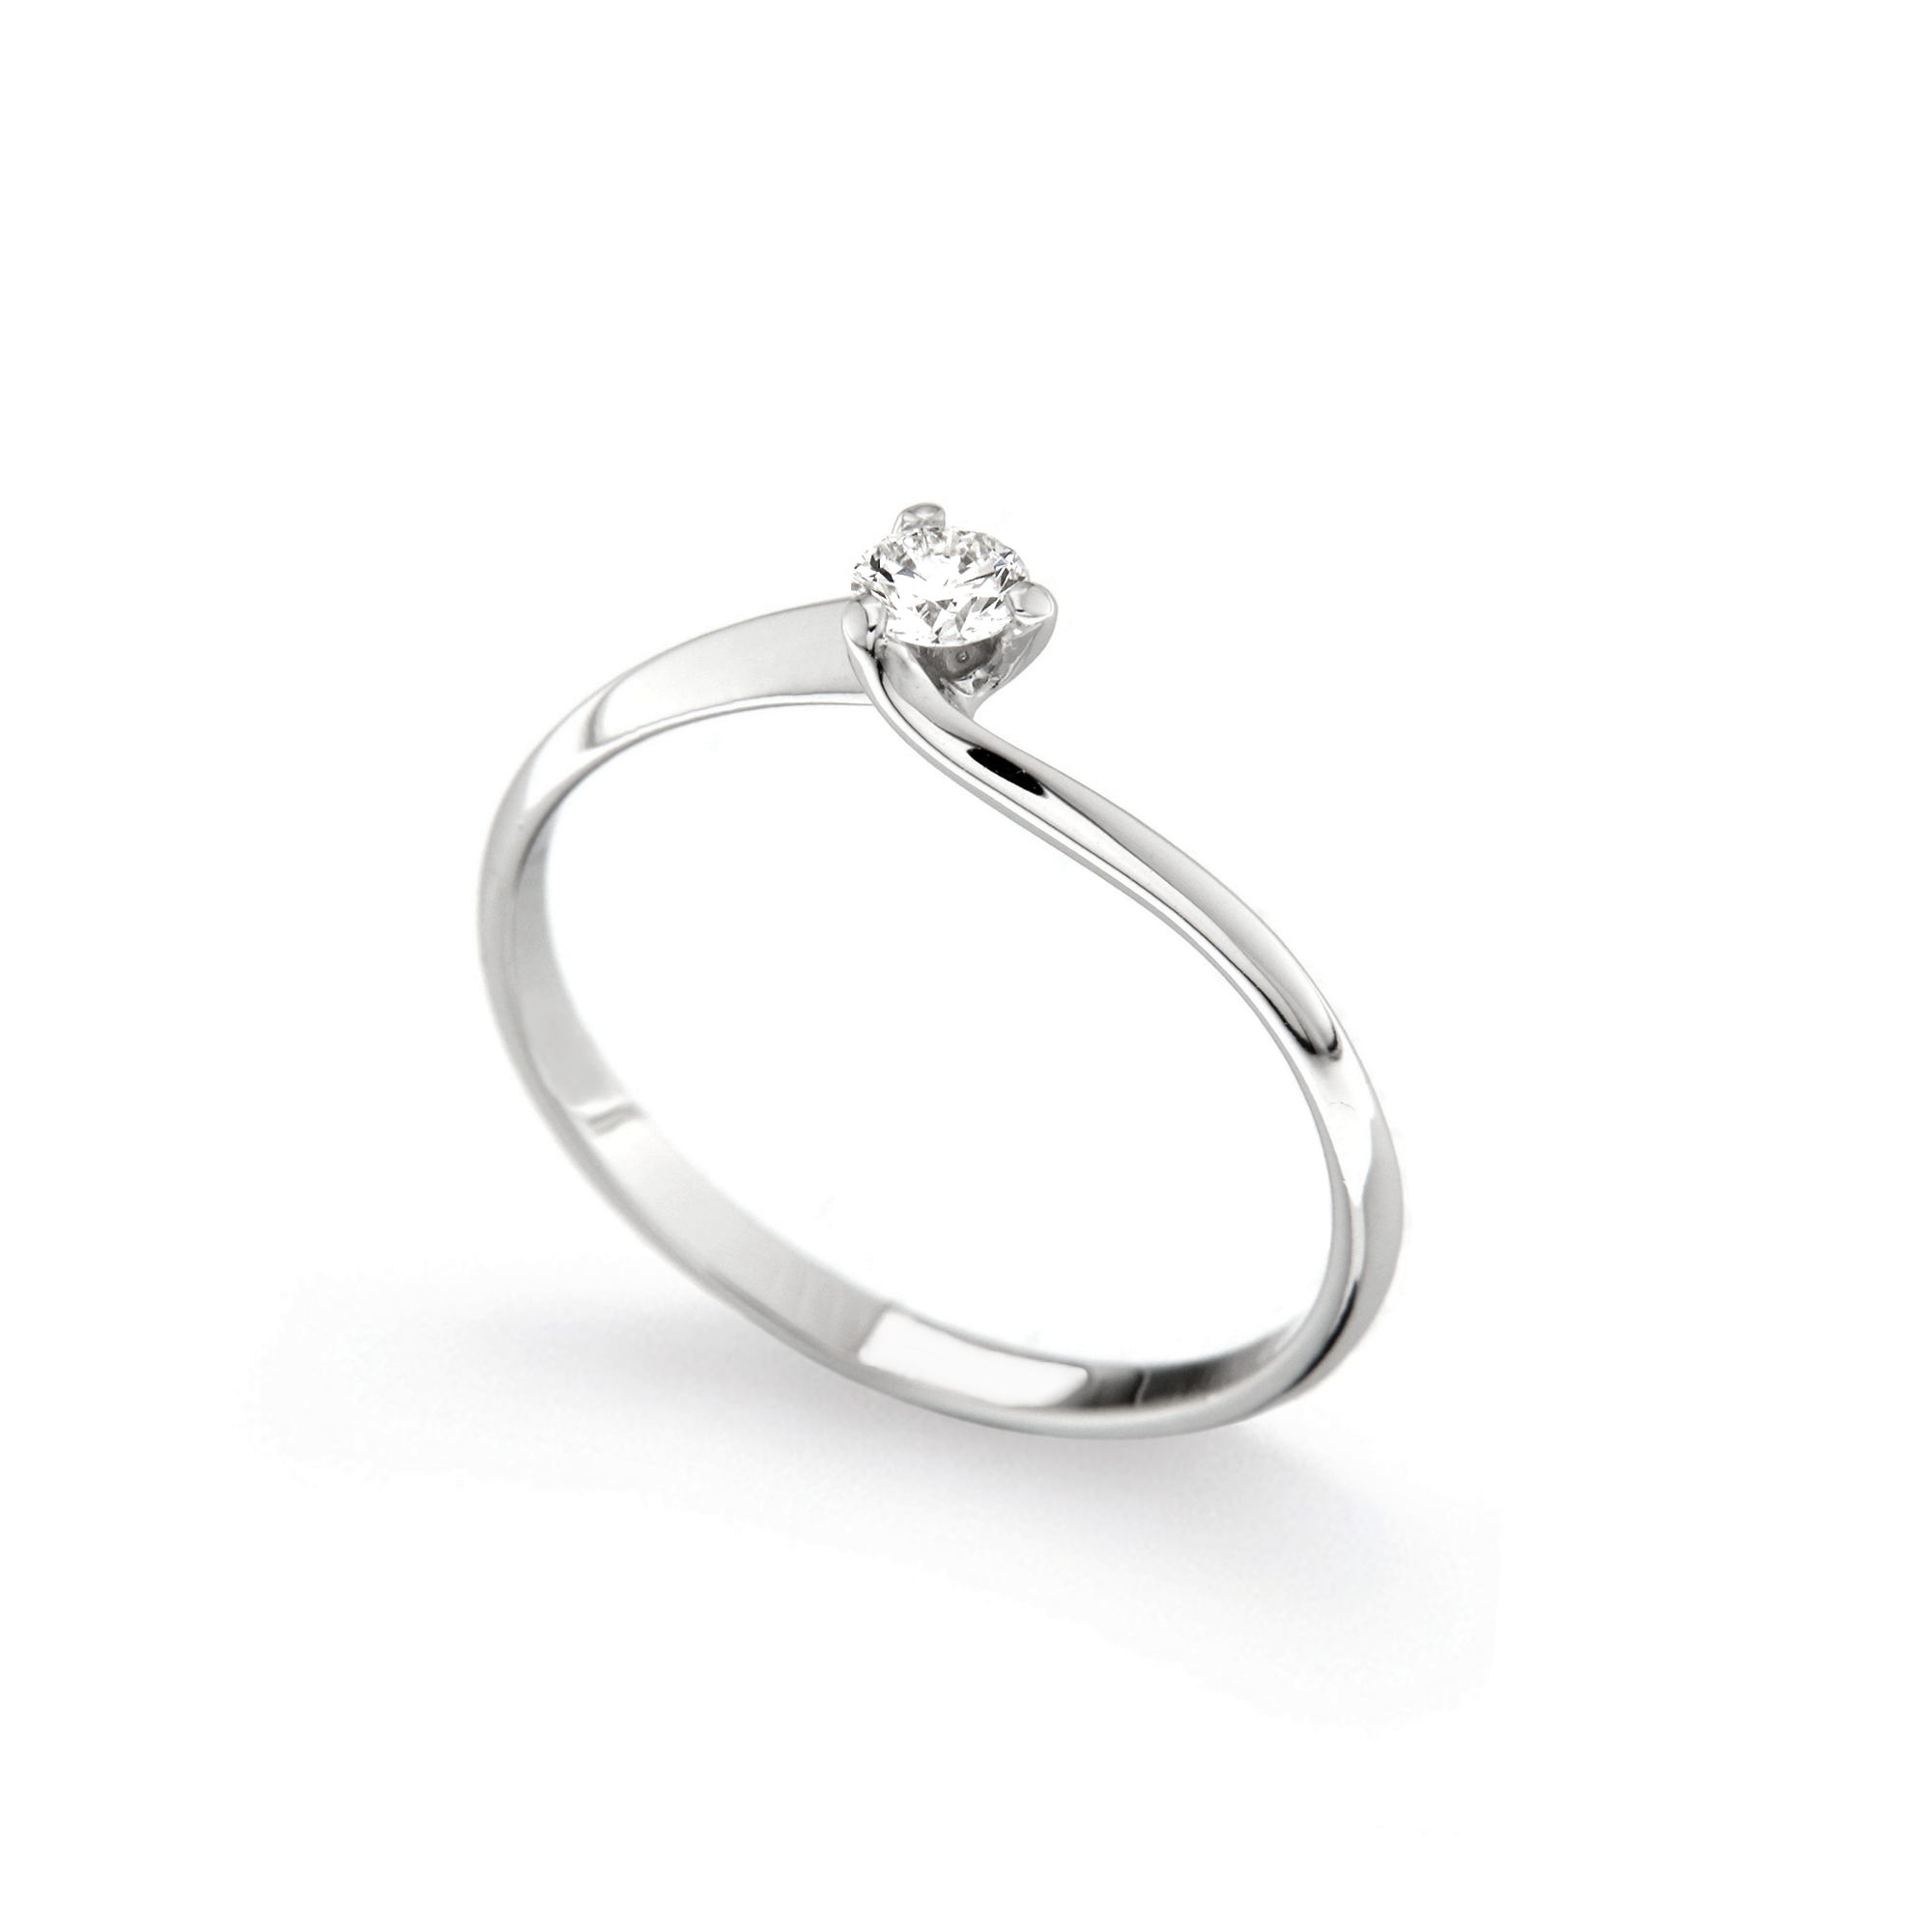 Inel de logodna din aur 18K cu diamant 0,15 ct., model Orsini 01028-15